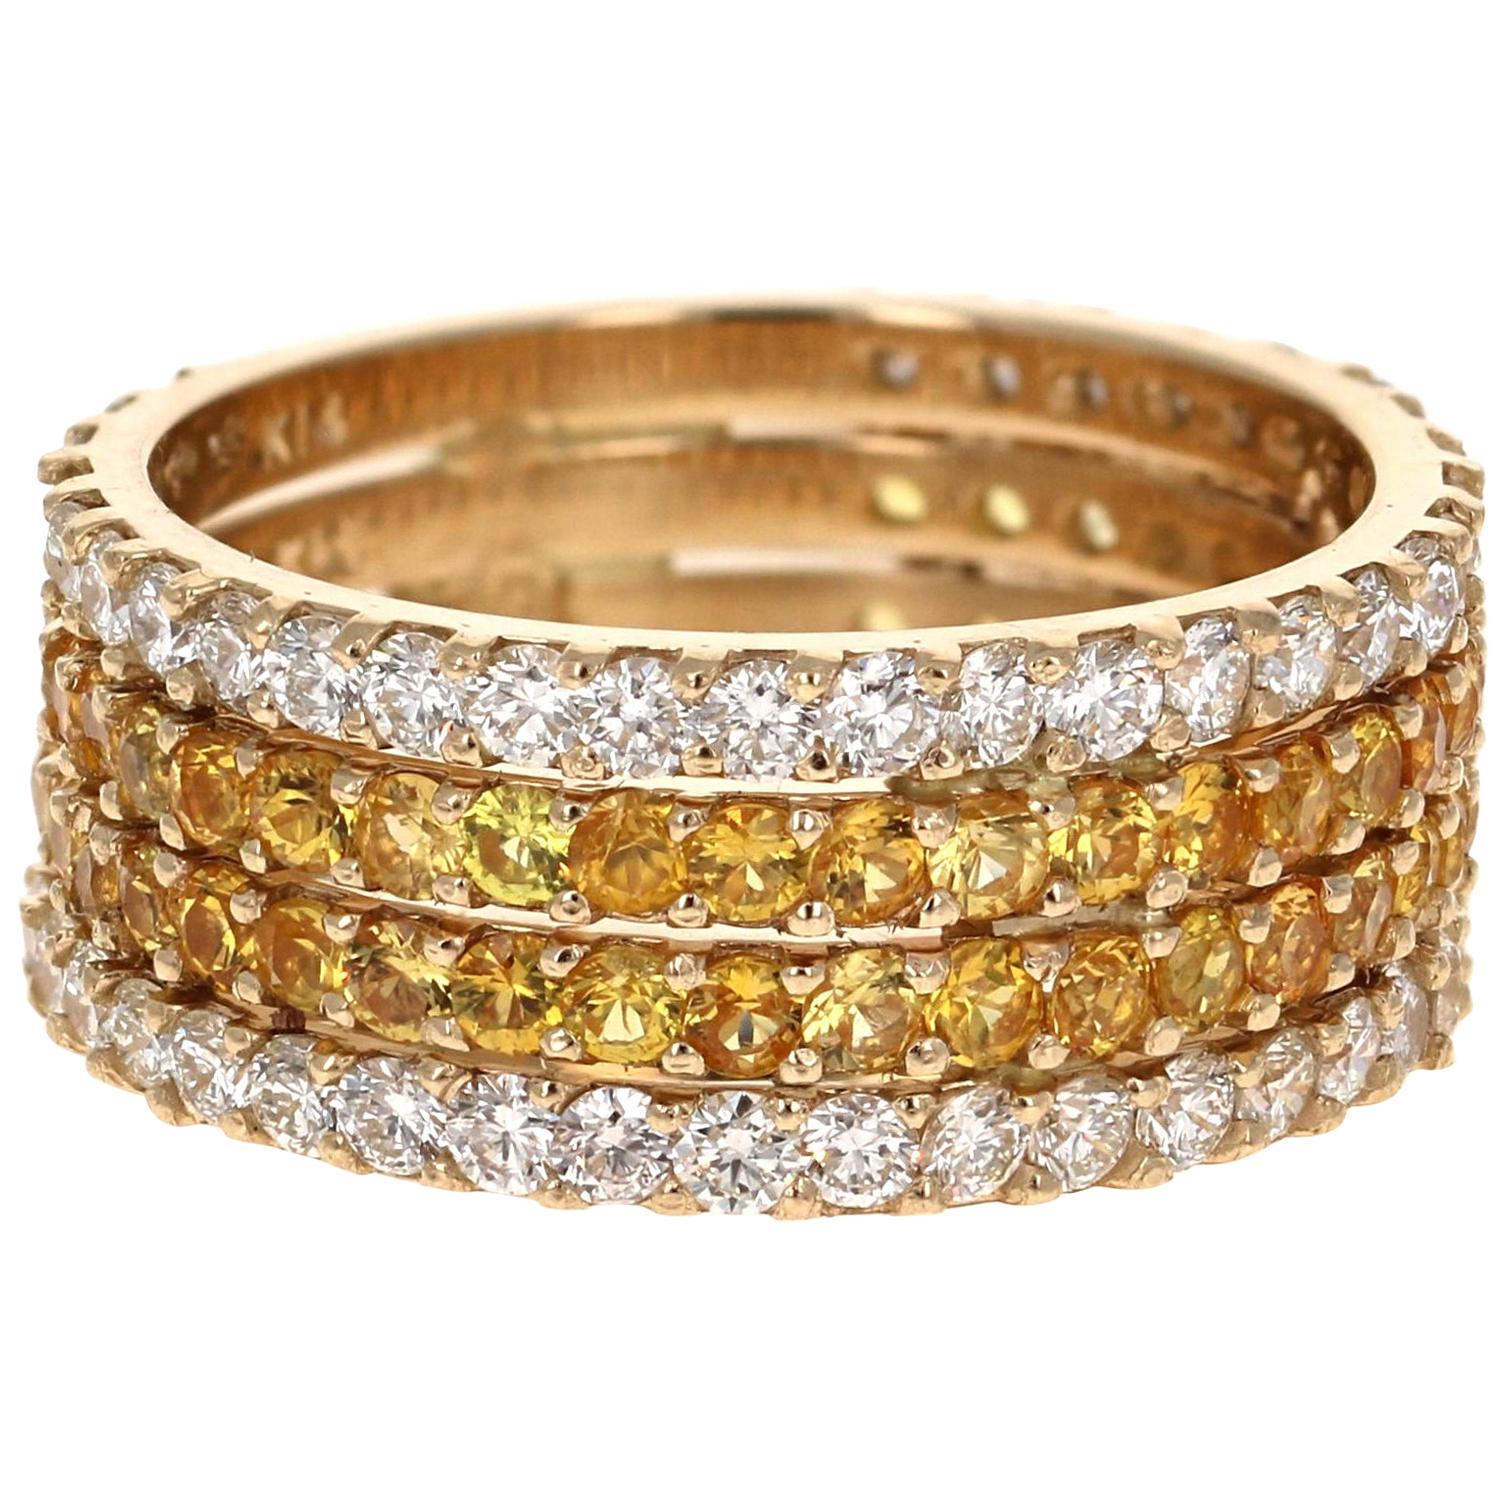 3.36 Carat Yellow Sapphire and White Diamond 14 Karat Yellow Gold Band